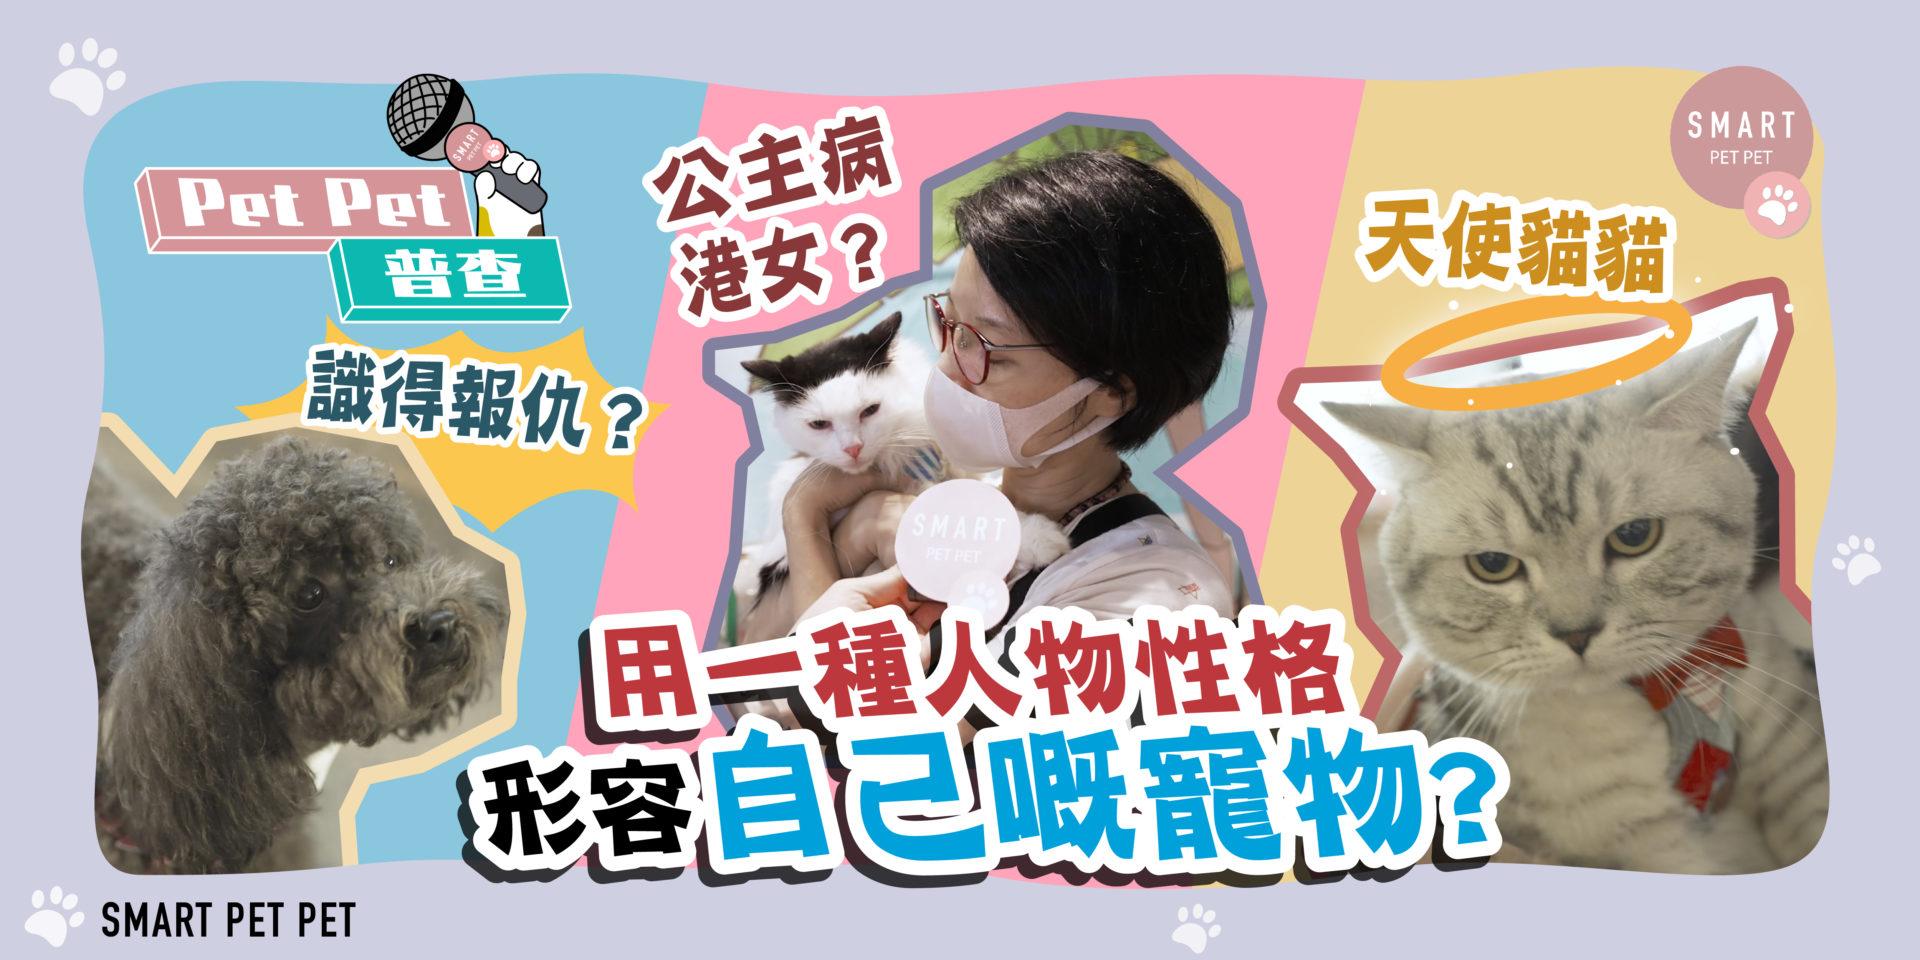 petpet普查_街訪_寵物性格_banner